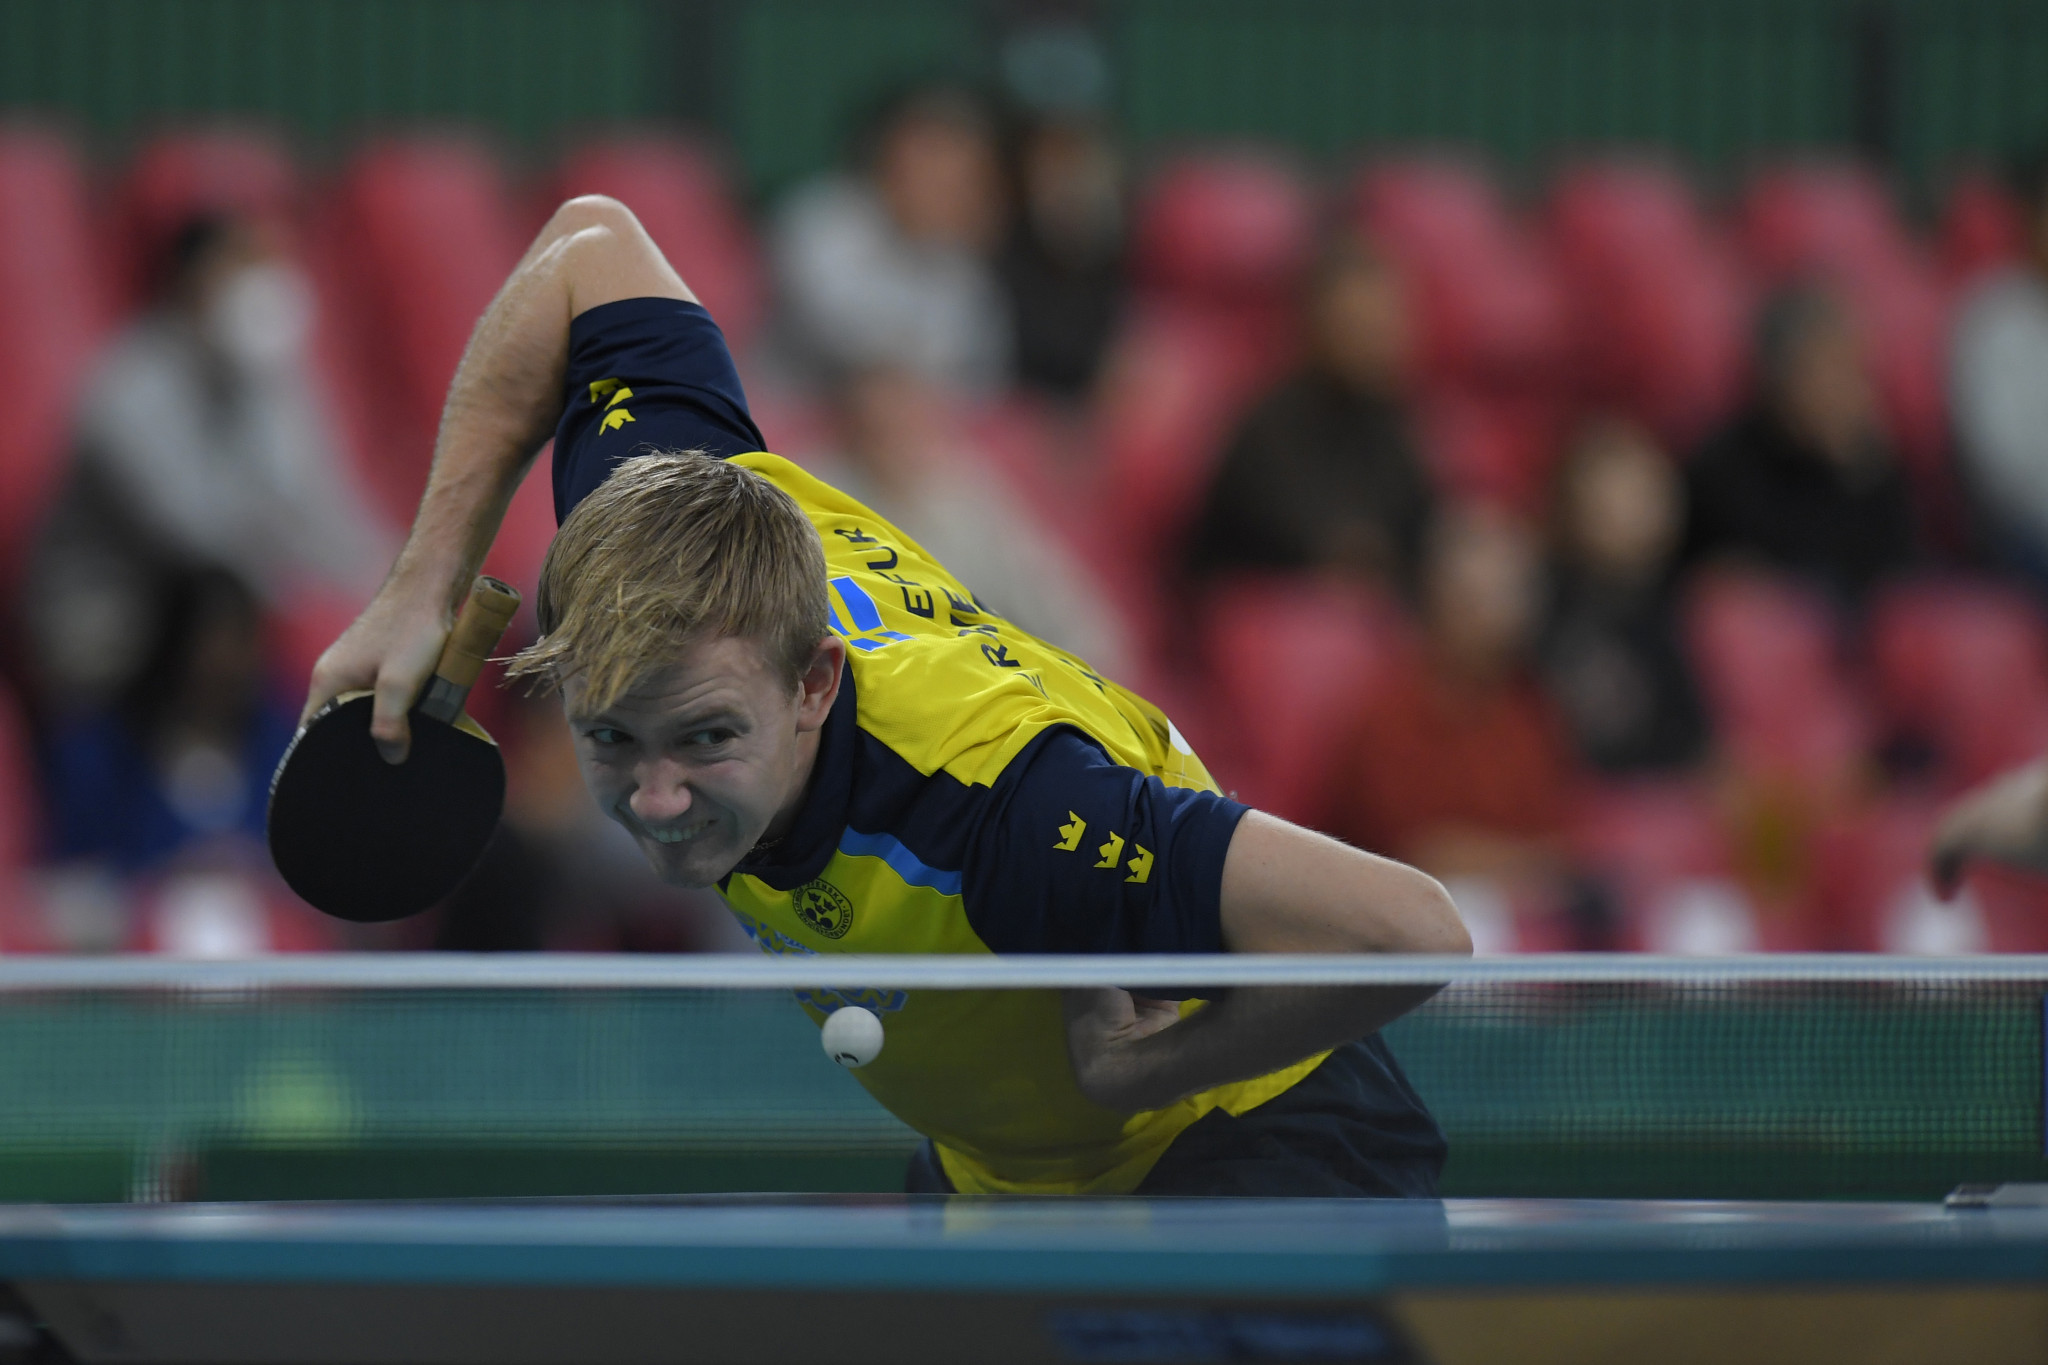 ITTF invites all professional players to enter Swedish International Open